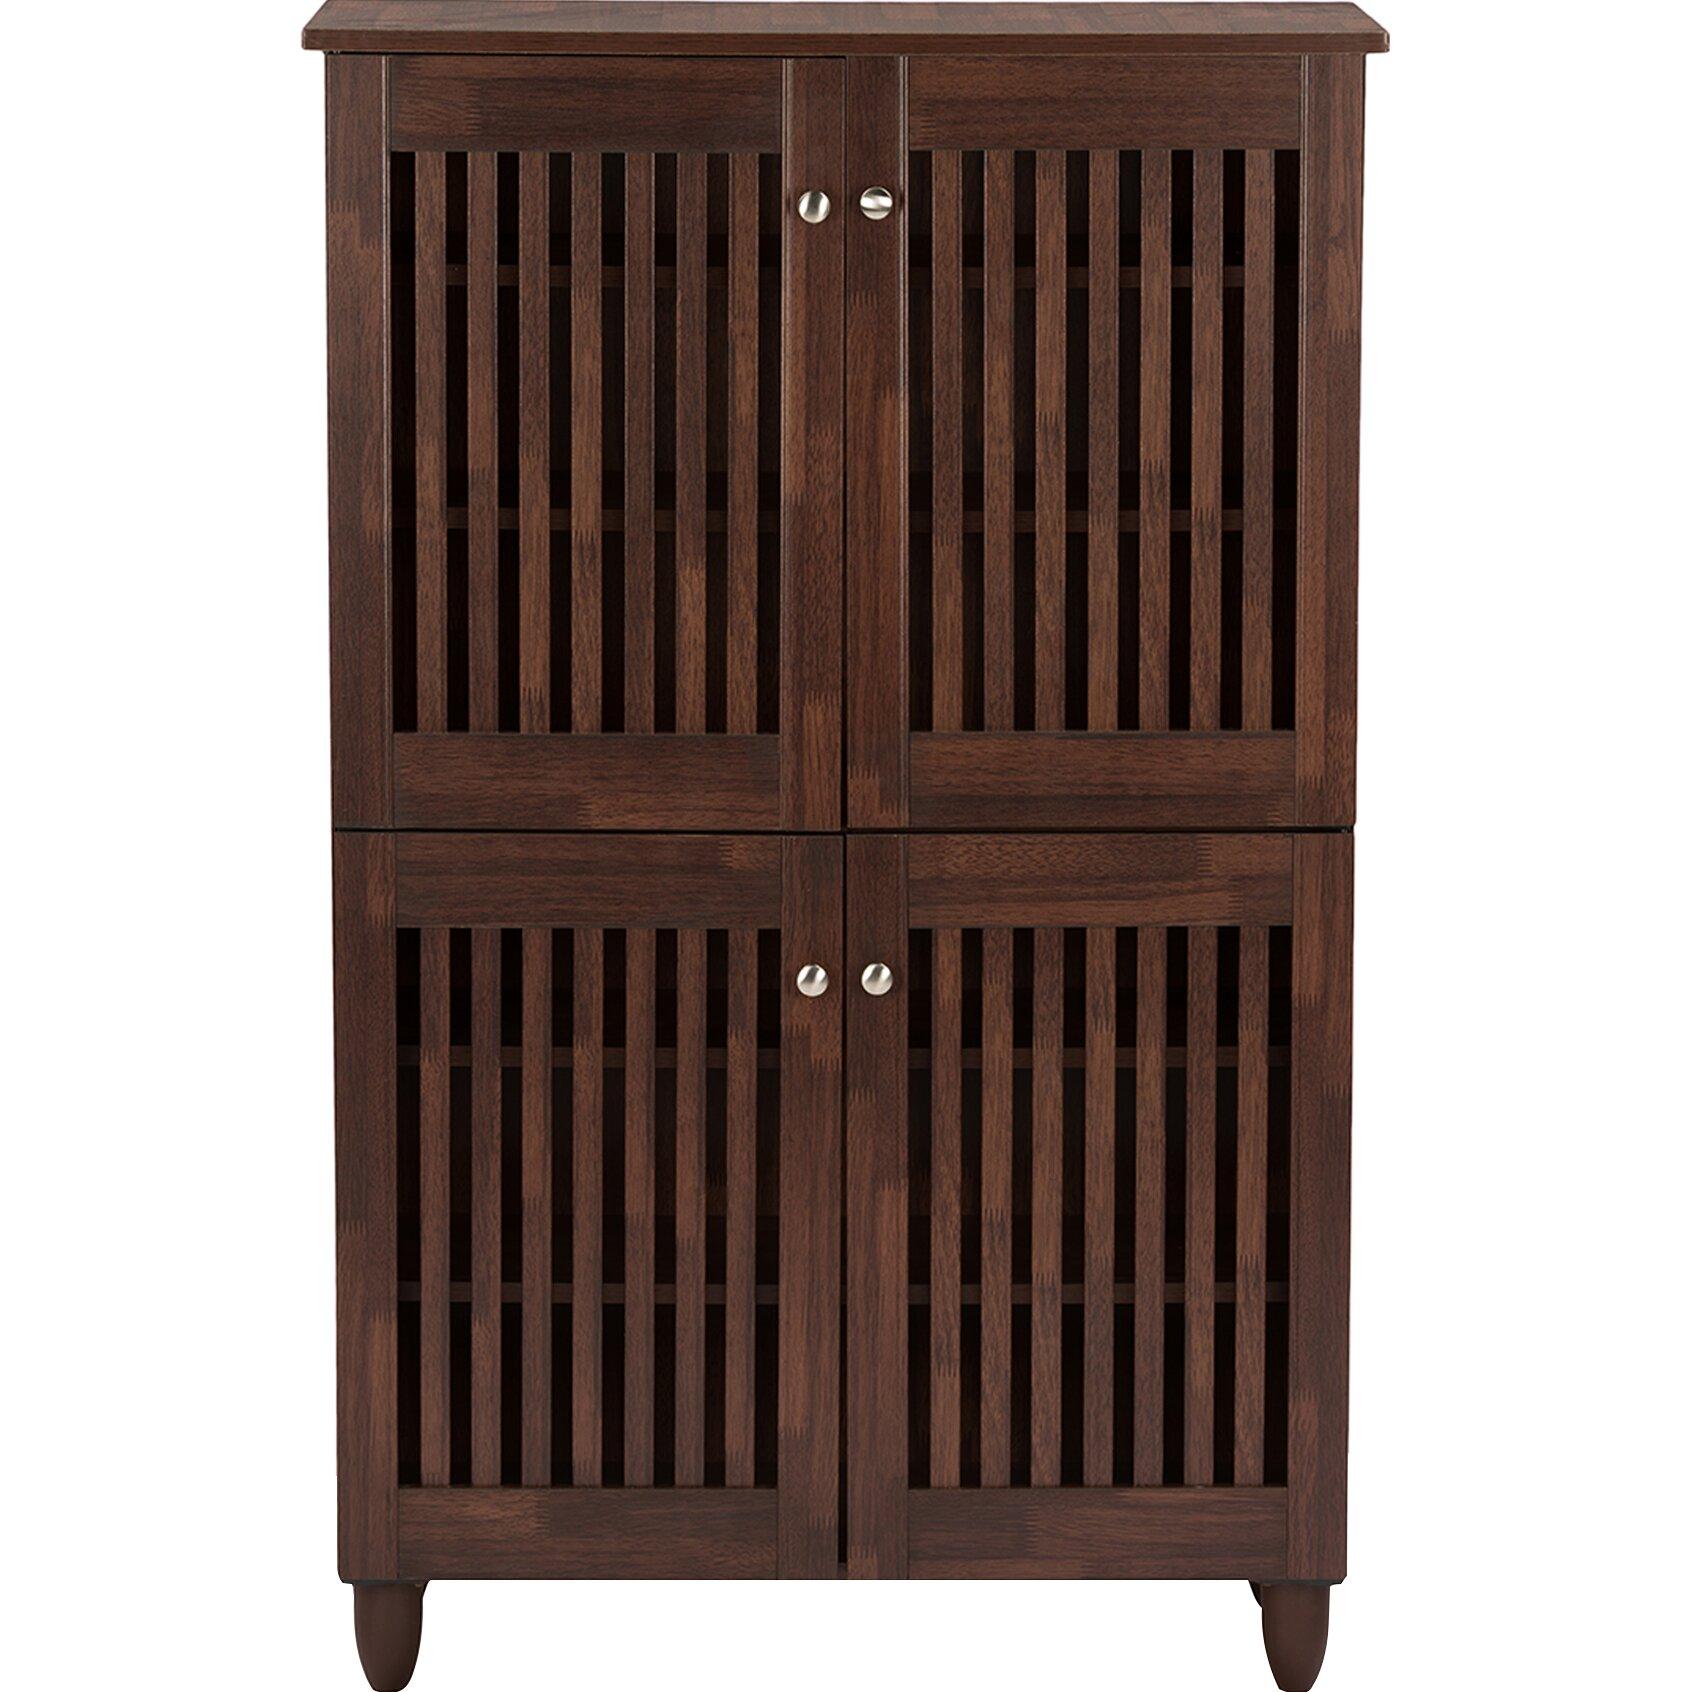 Wholesale interiors baxton studio fernanda 18 pair shoe storage cabinet reviews wayfair - How to build shoe storage cabinet ...